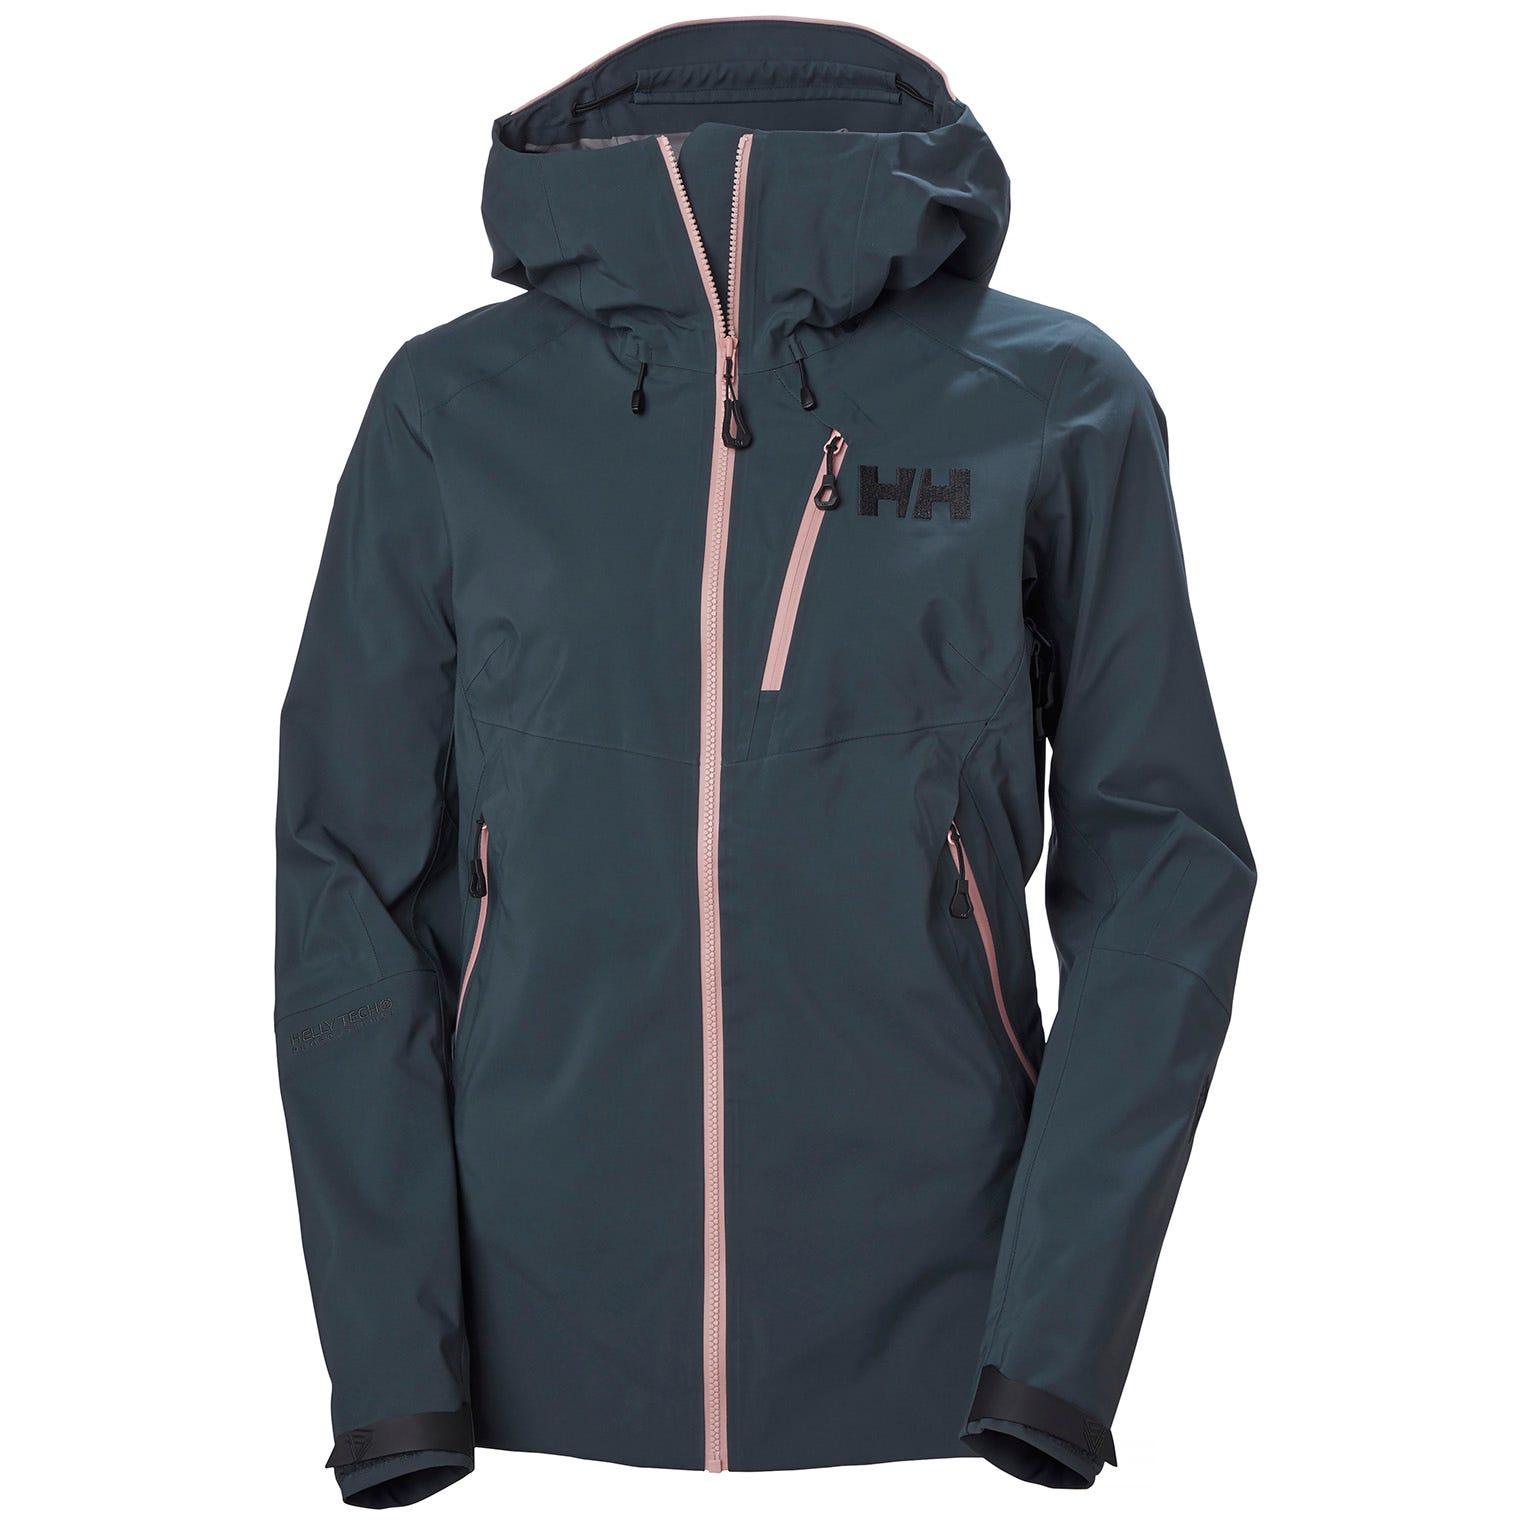 Helly Hansen Womens Hiking Jacket XS